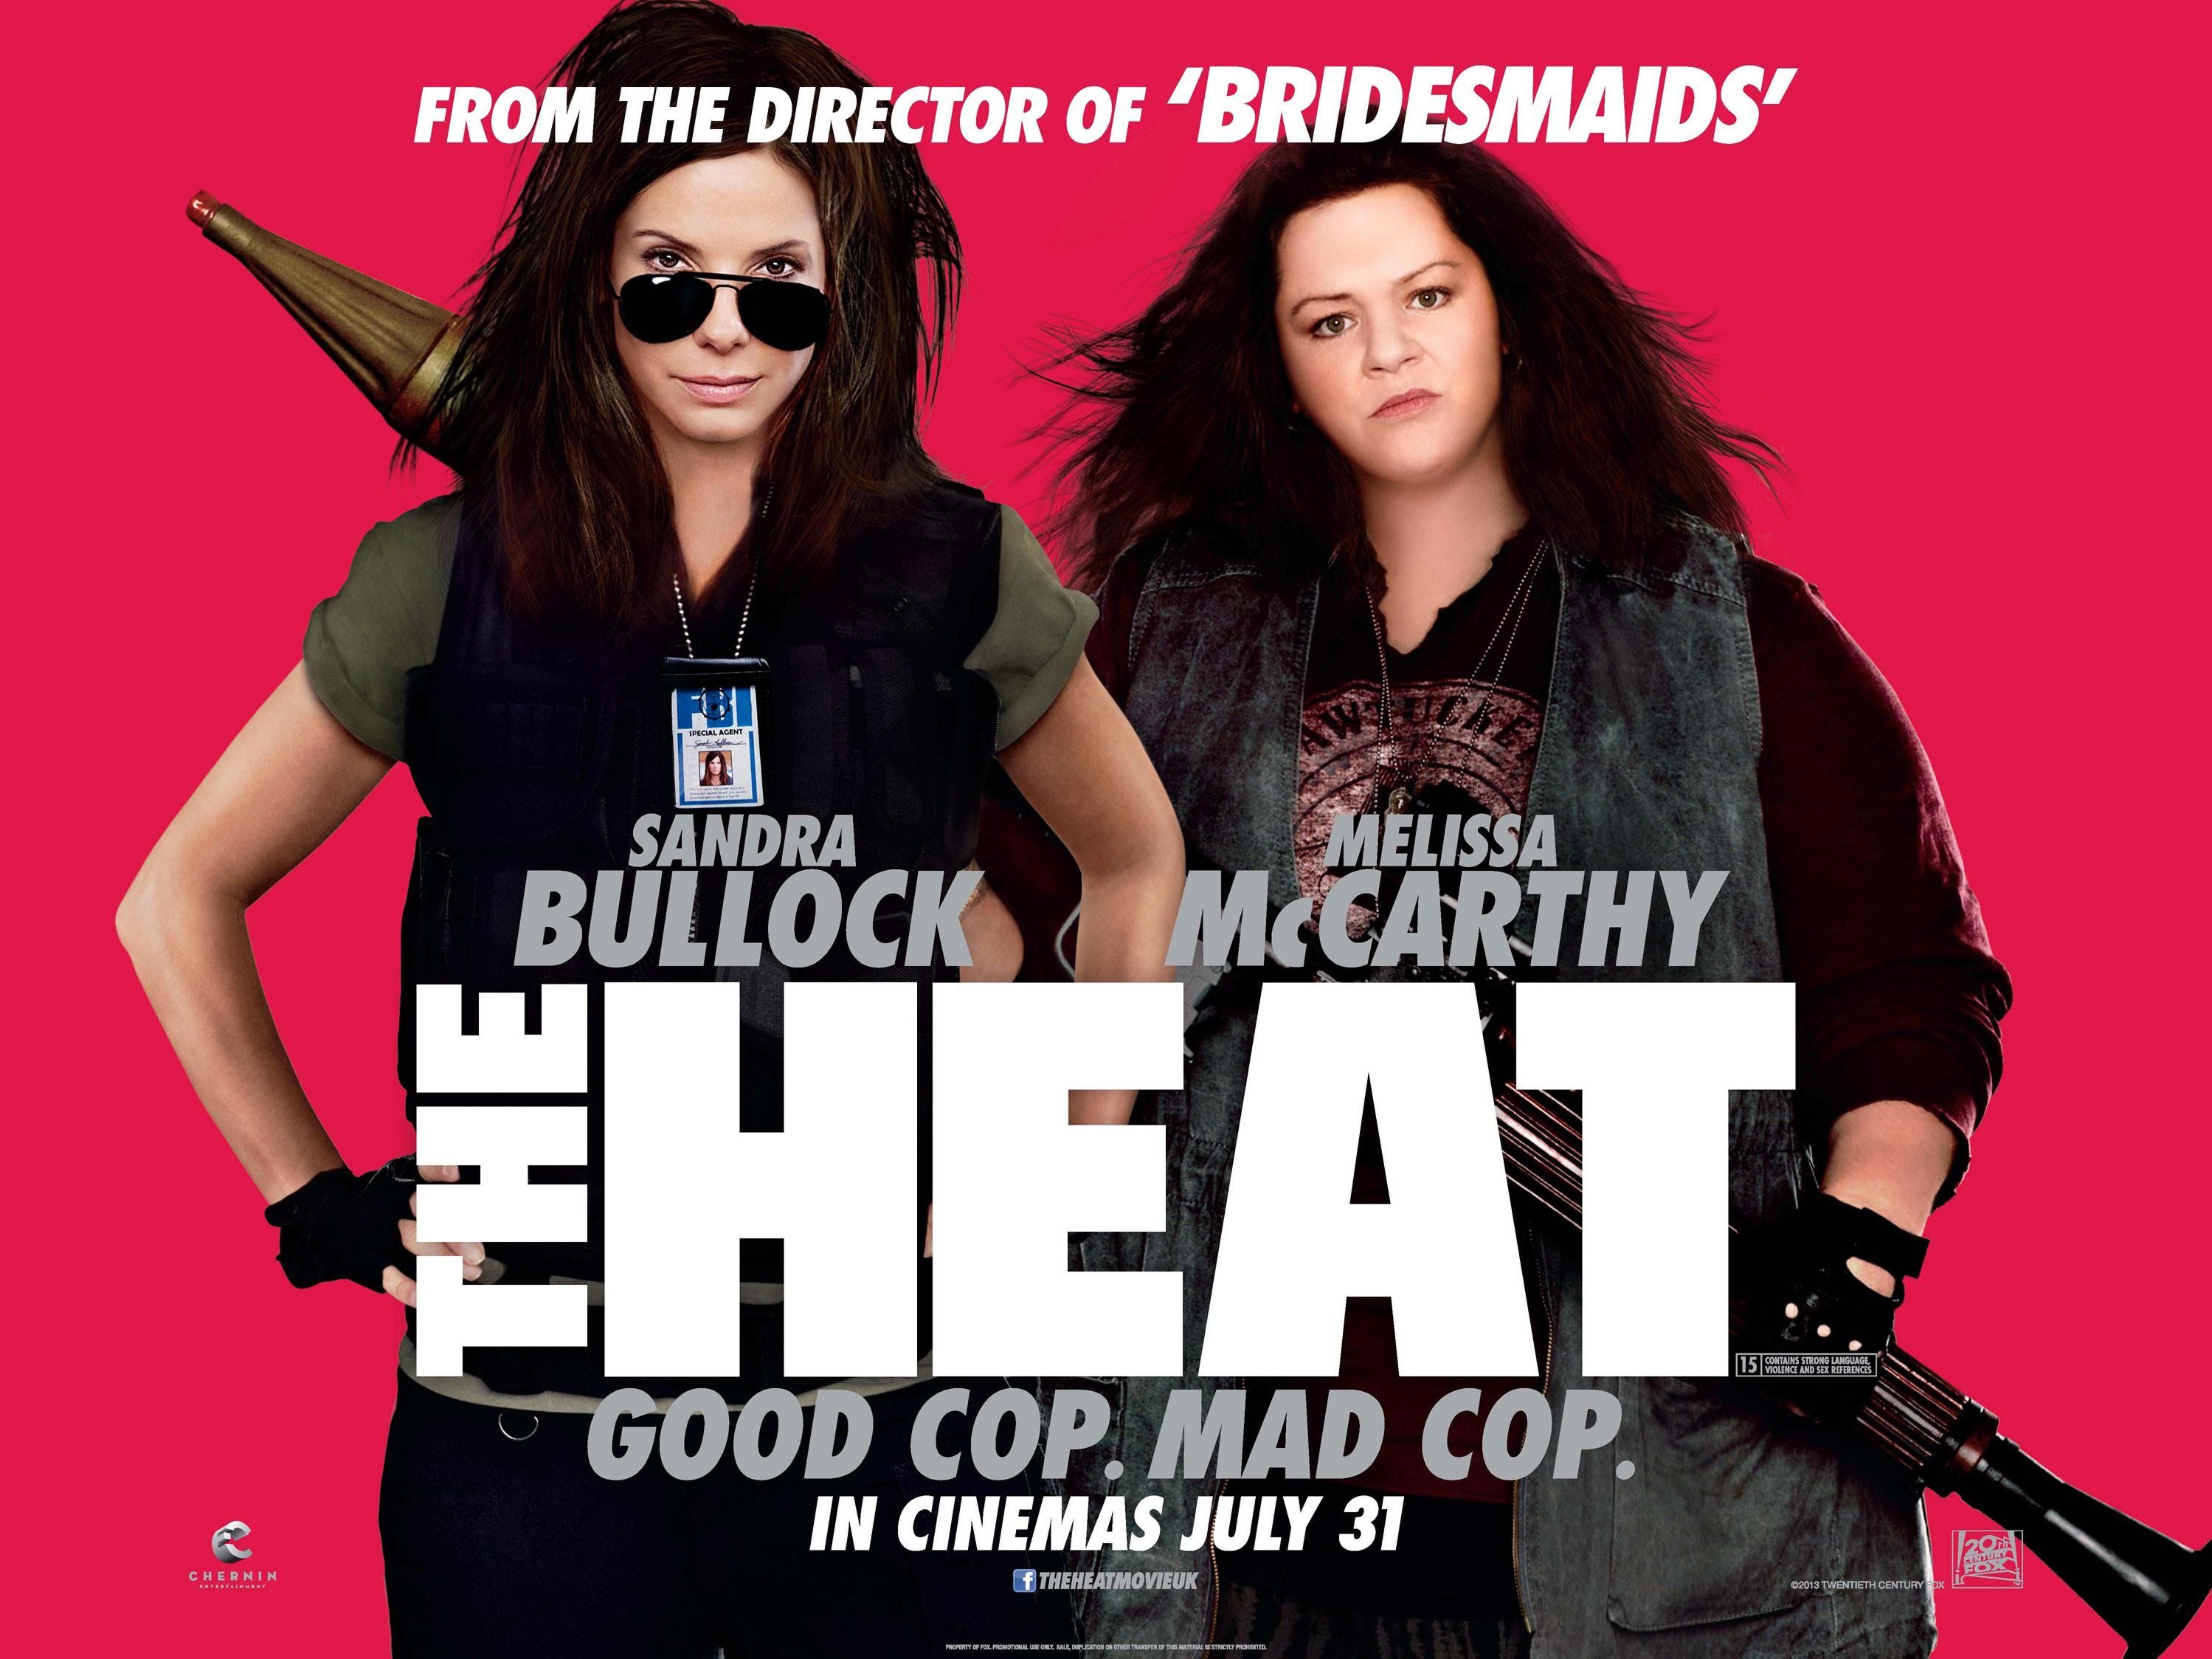 fbi swat melissa mccarthy 2016 movies sandra bullock michael mcdonald - Funny Valentines Movie 1999 Watch Online